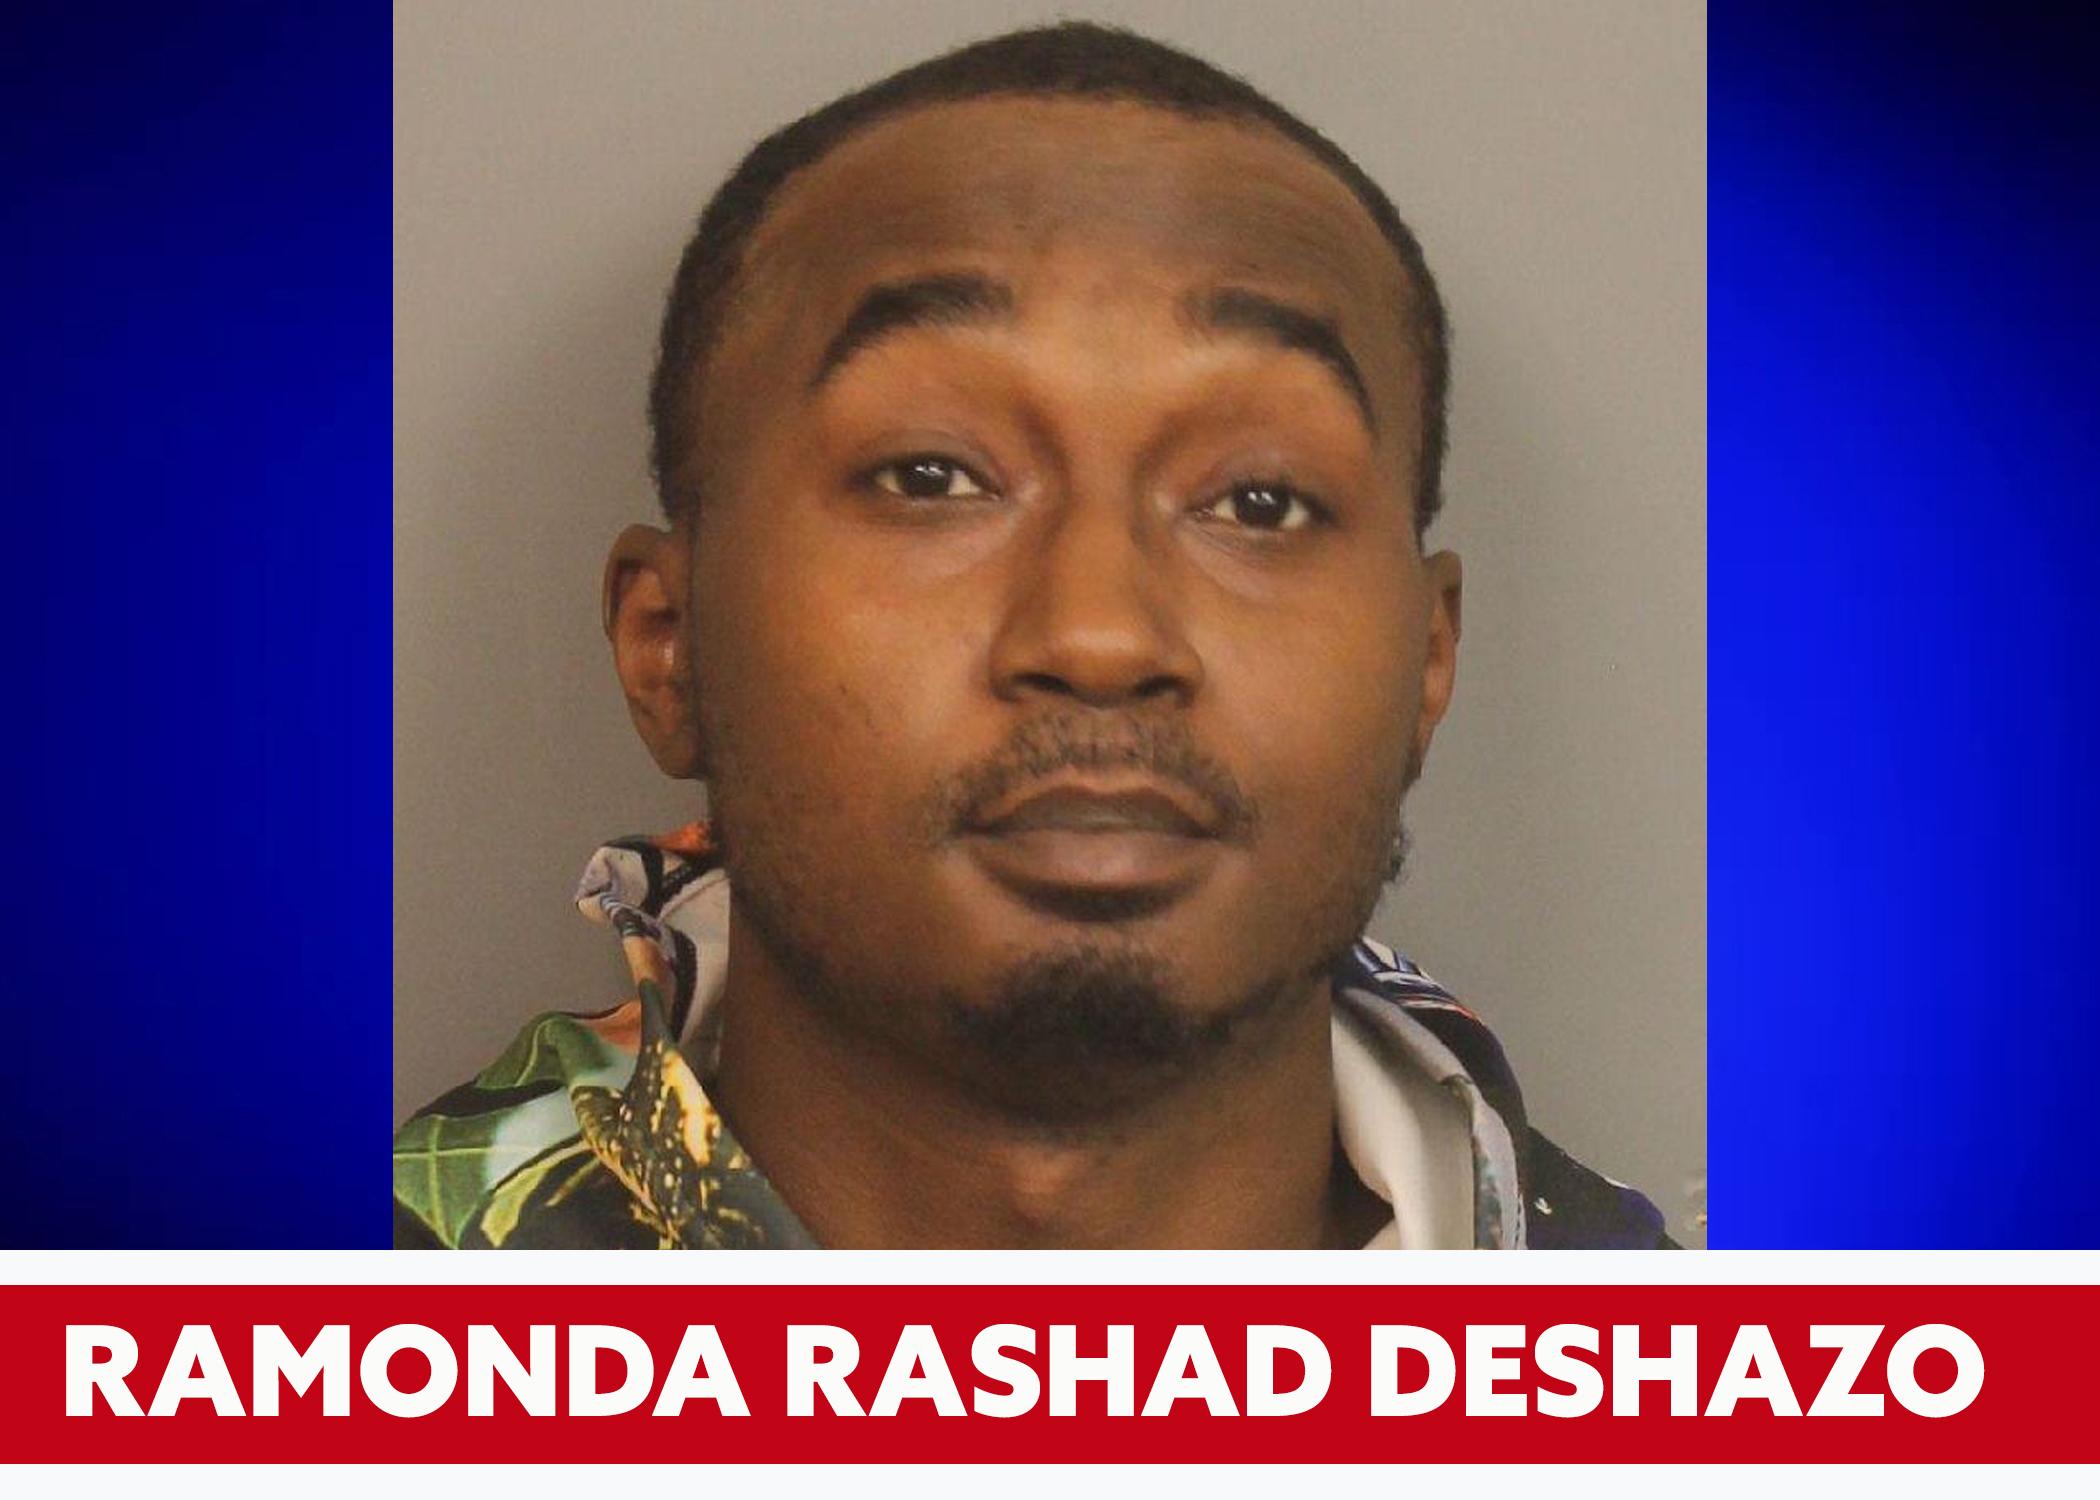 Trussville man arrested in connection to drug investigation